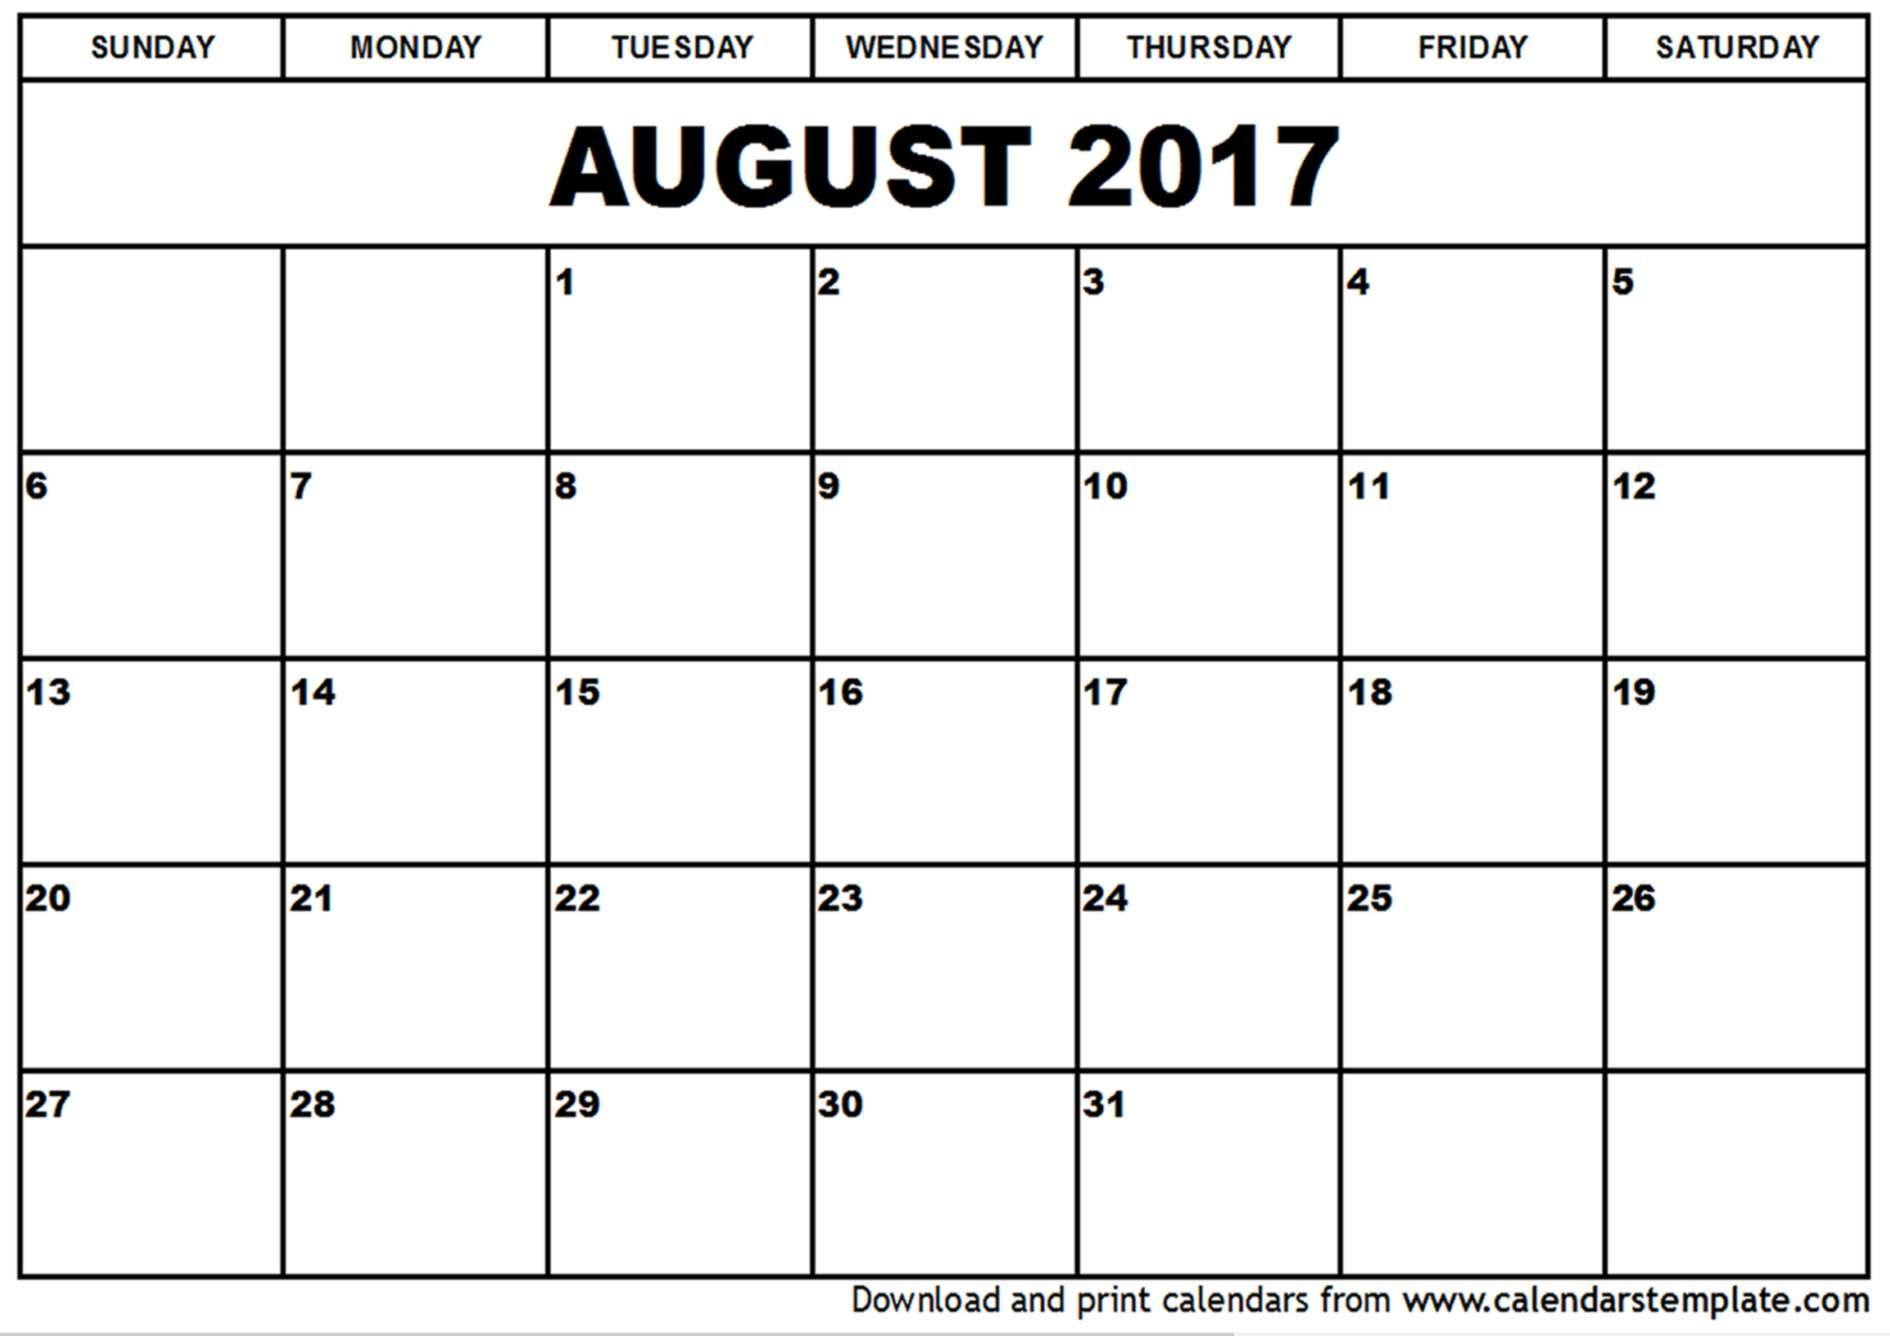 August 2017 Printable Calendar   August 2017 Calendar   Pinterest - Free Printable August 2017